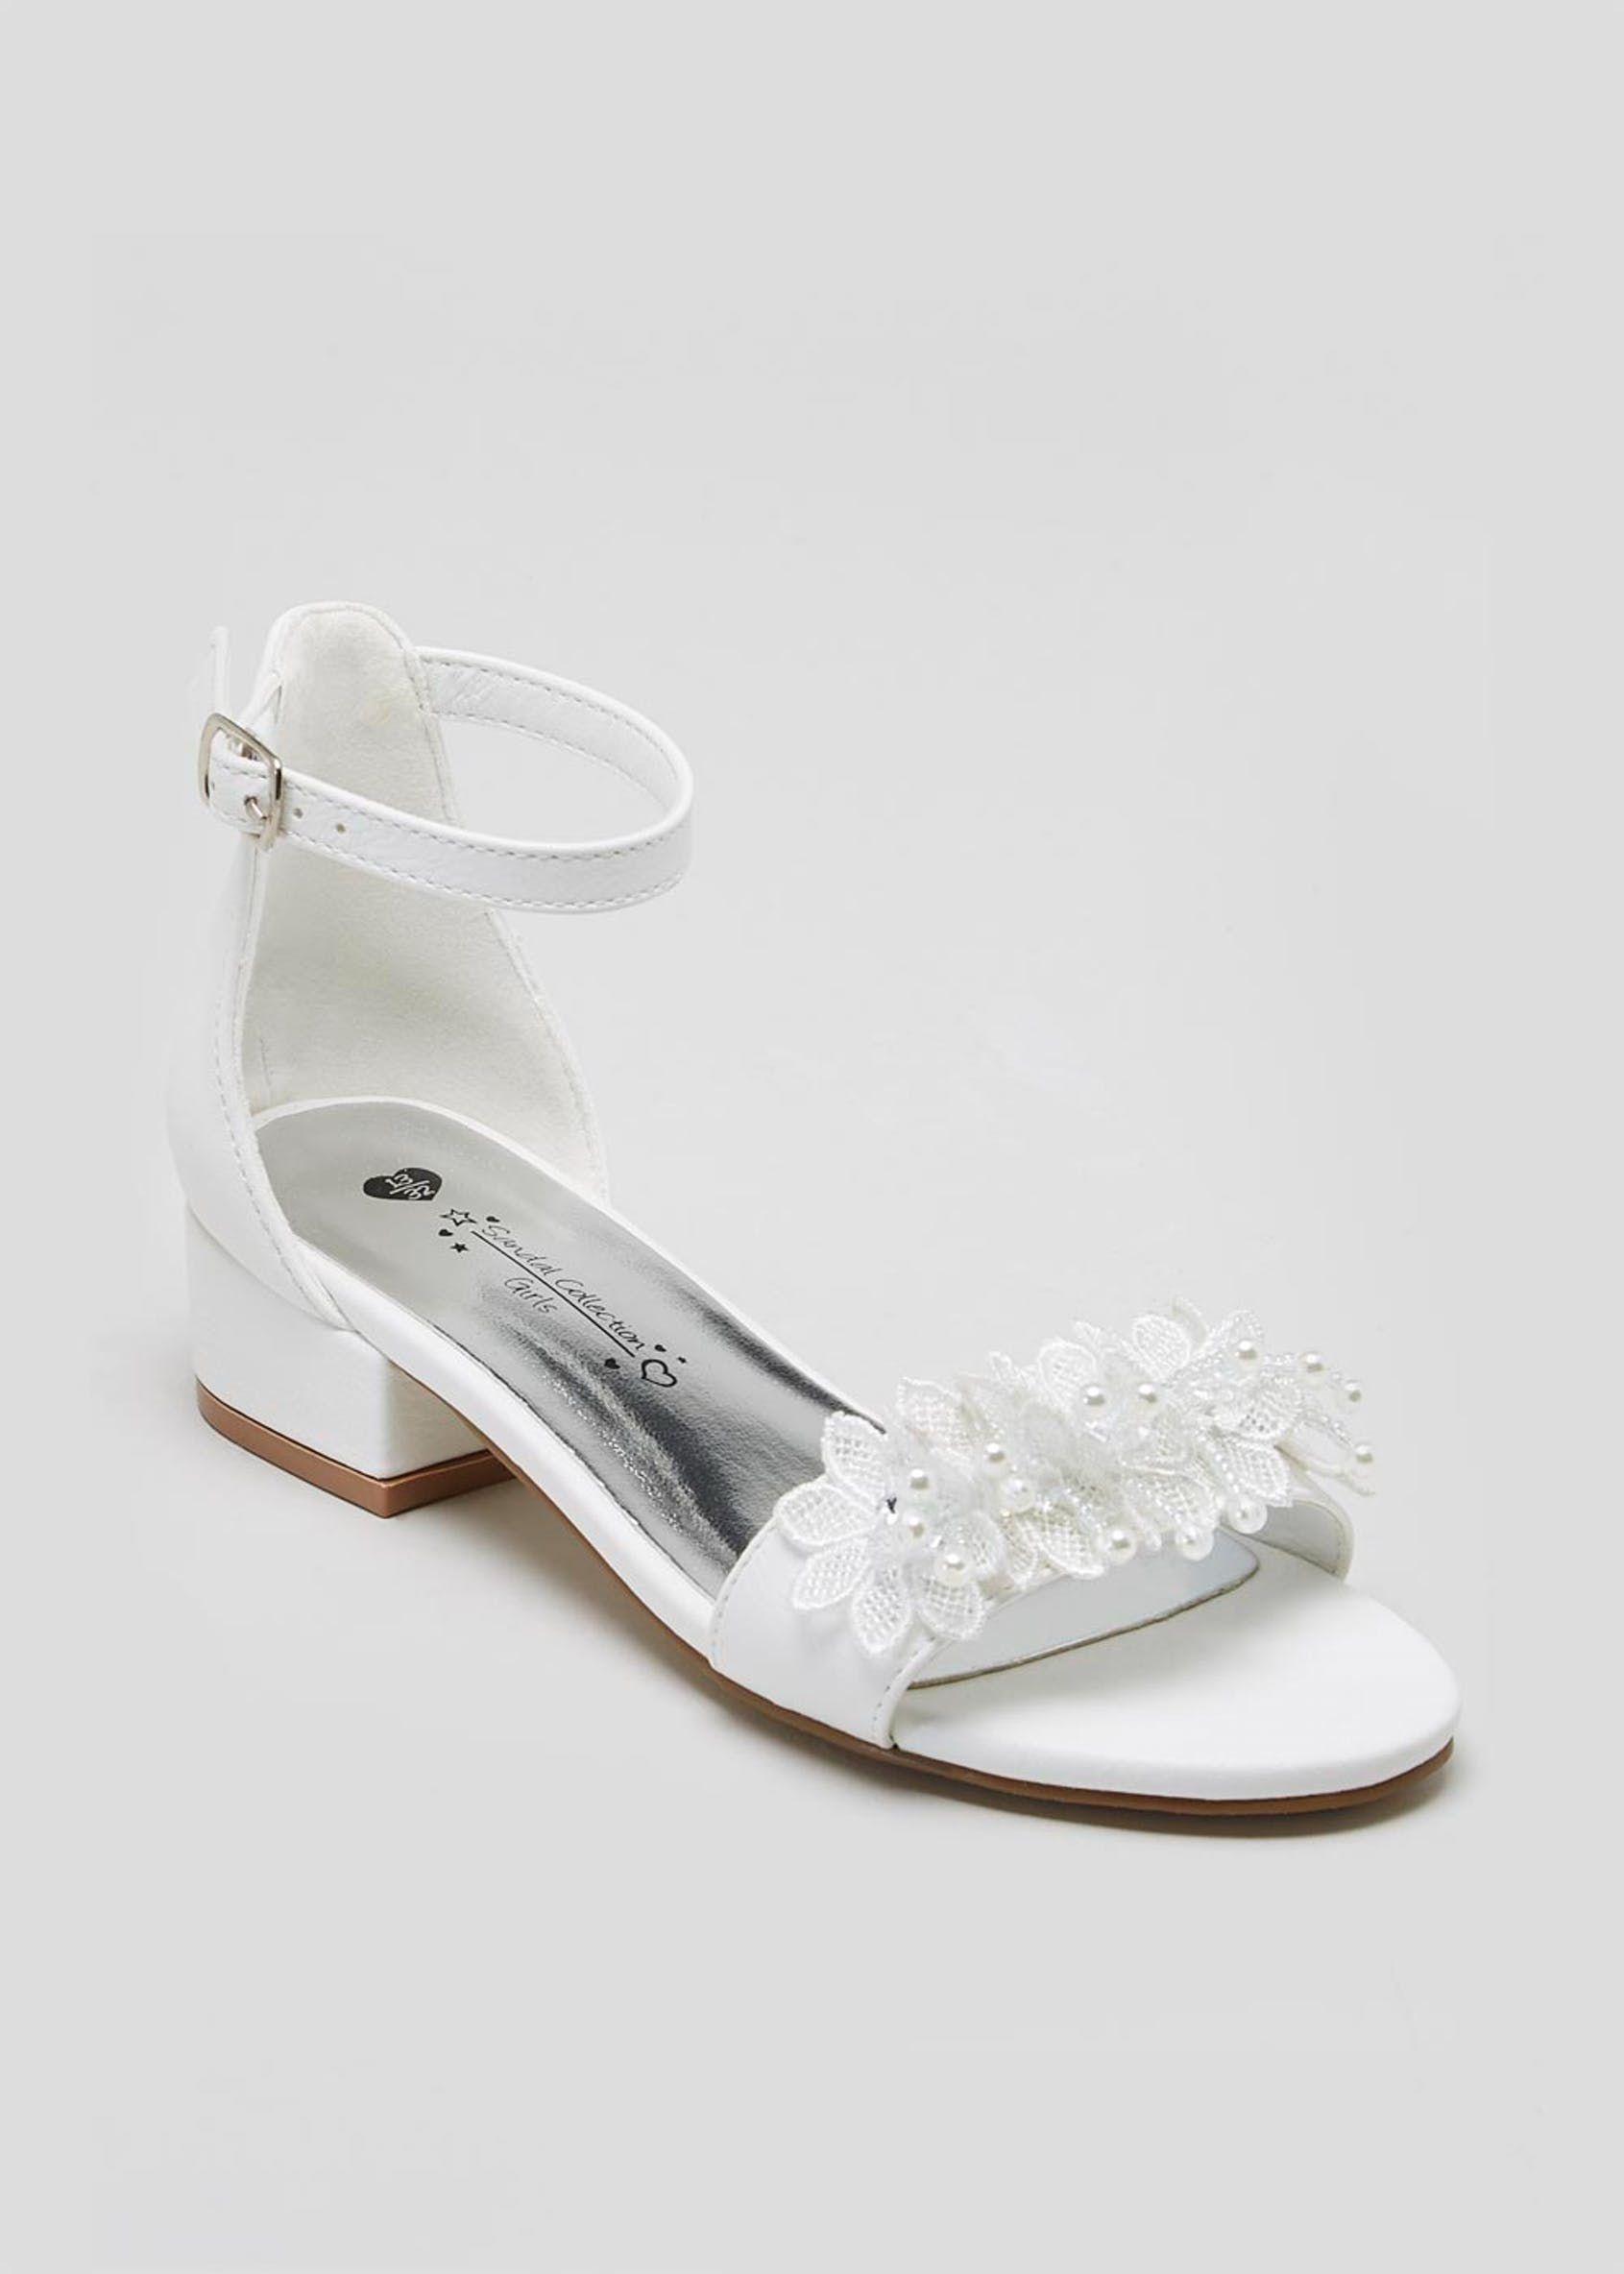 Heels, Ankle strap, Sandals